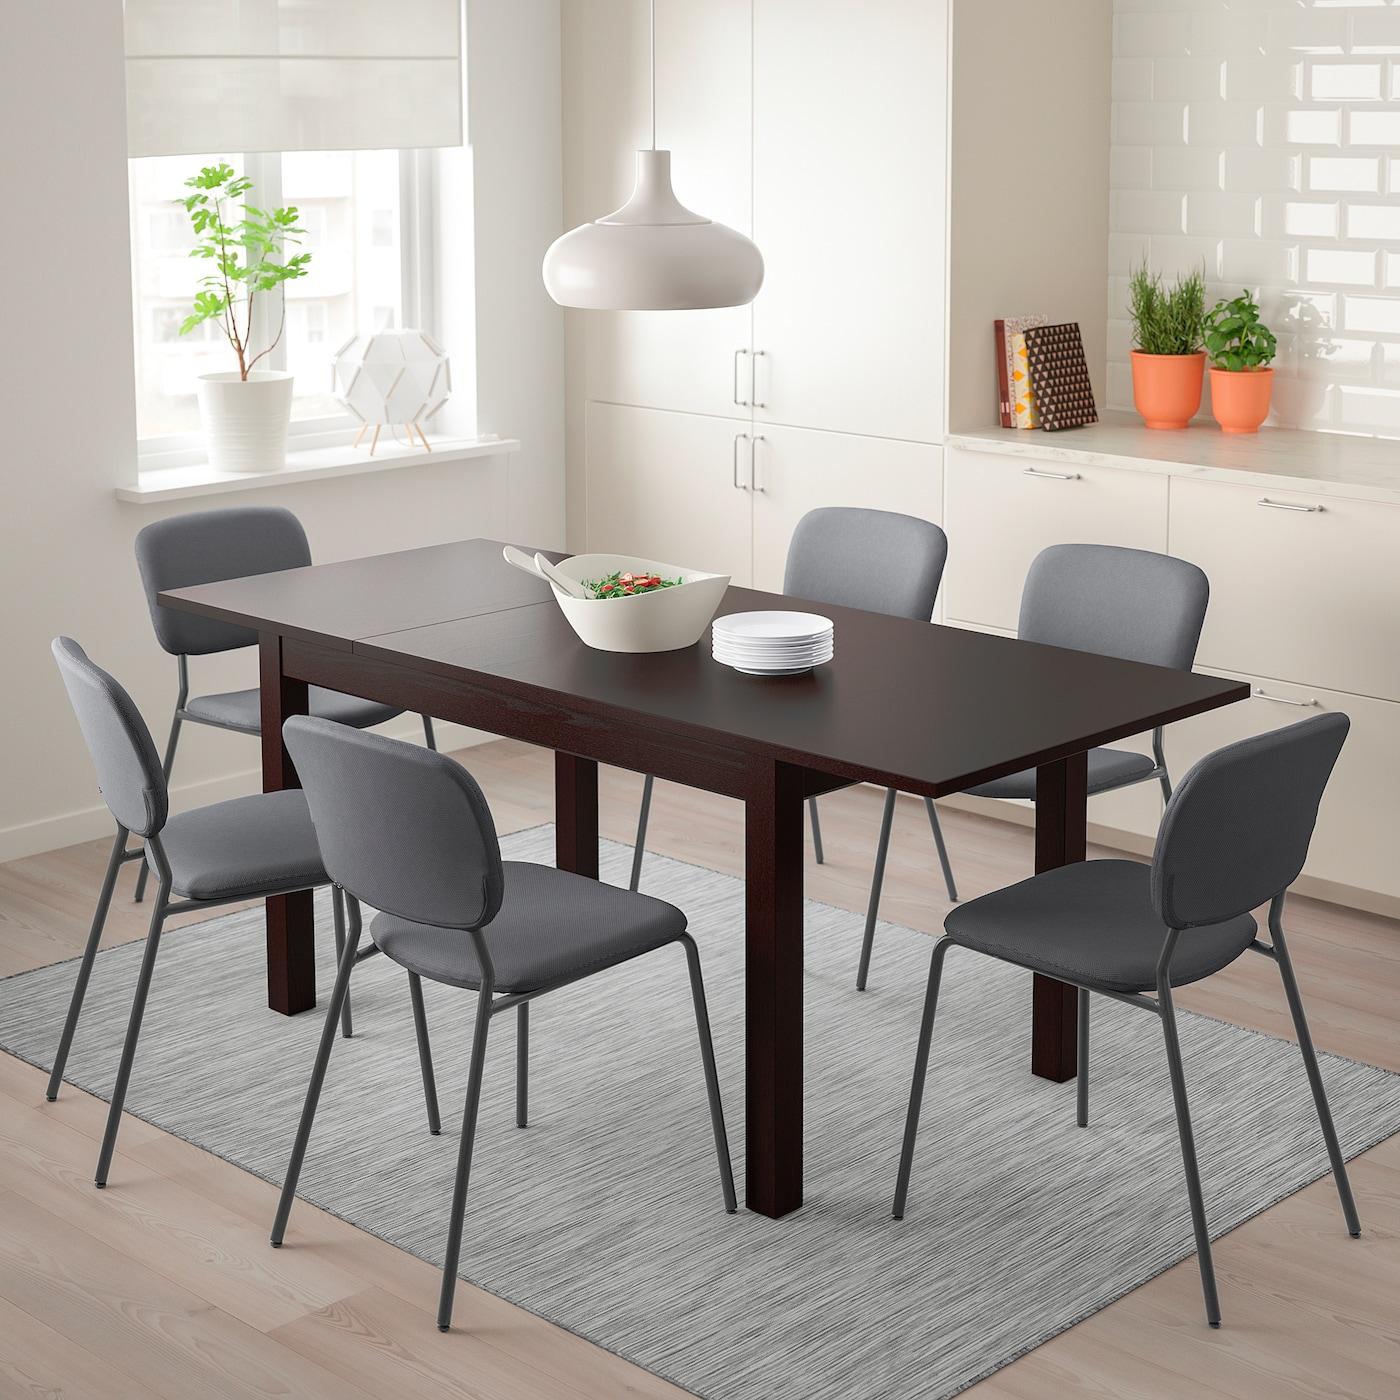 LANEBERG KARLJAN Bord och 4 stolar brunmörkgrå mörkgrå 130190x80 cm